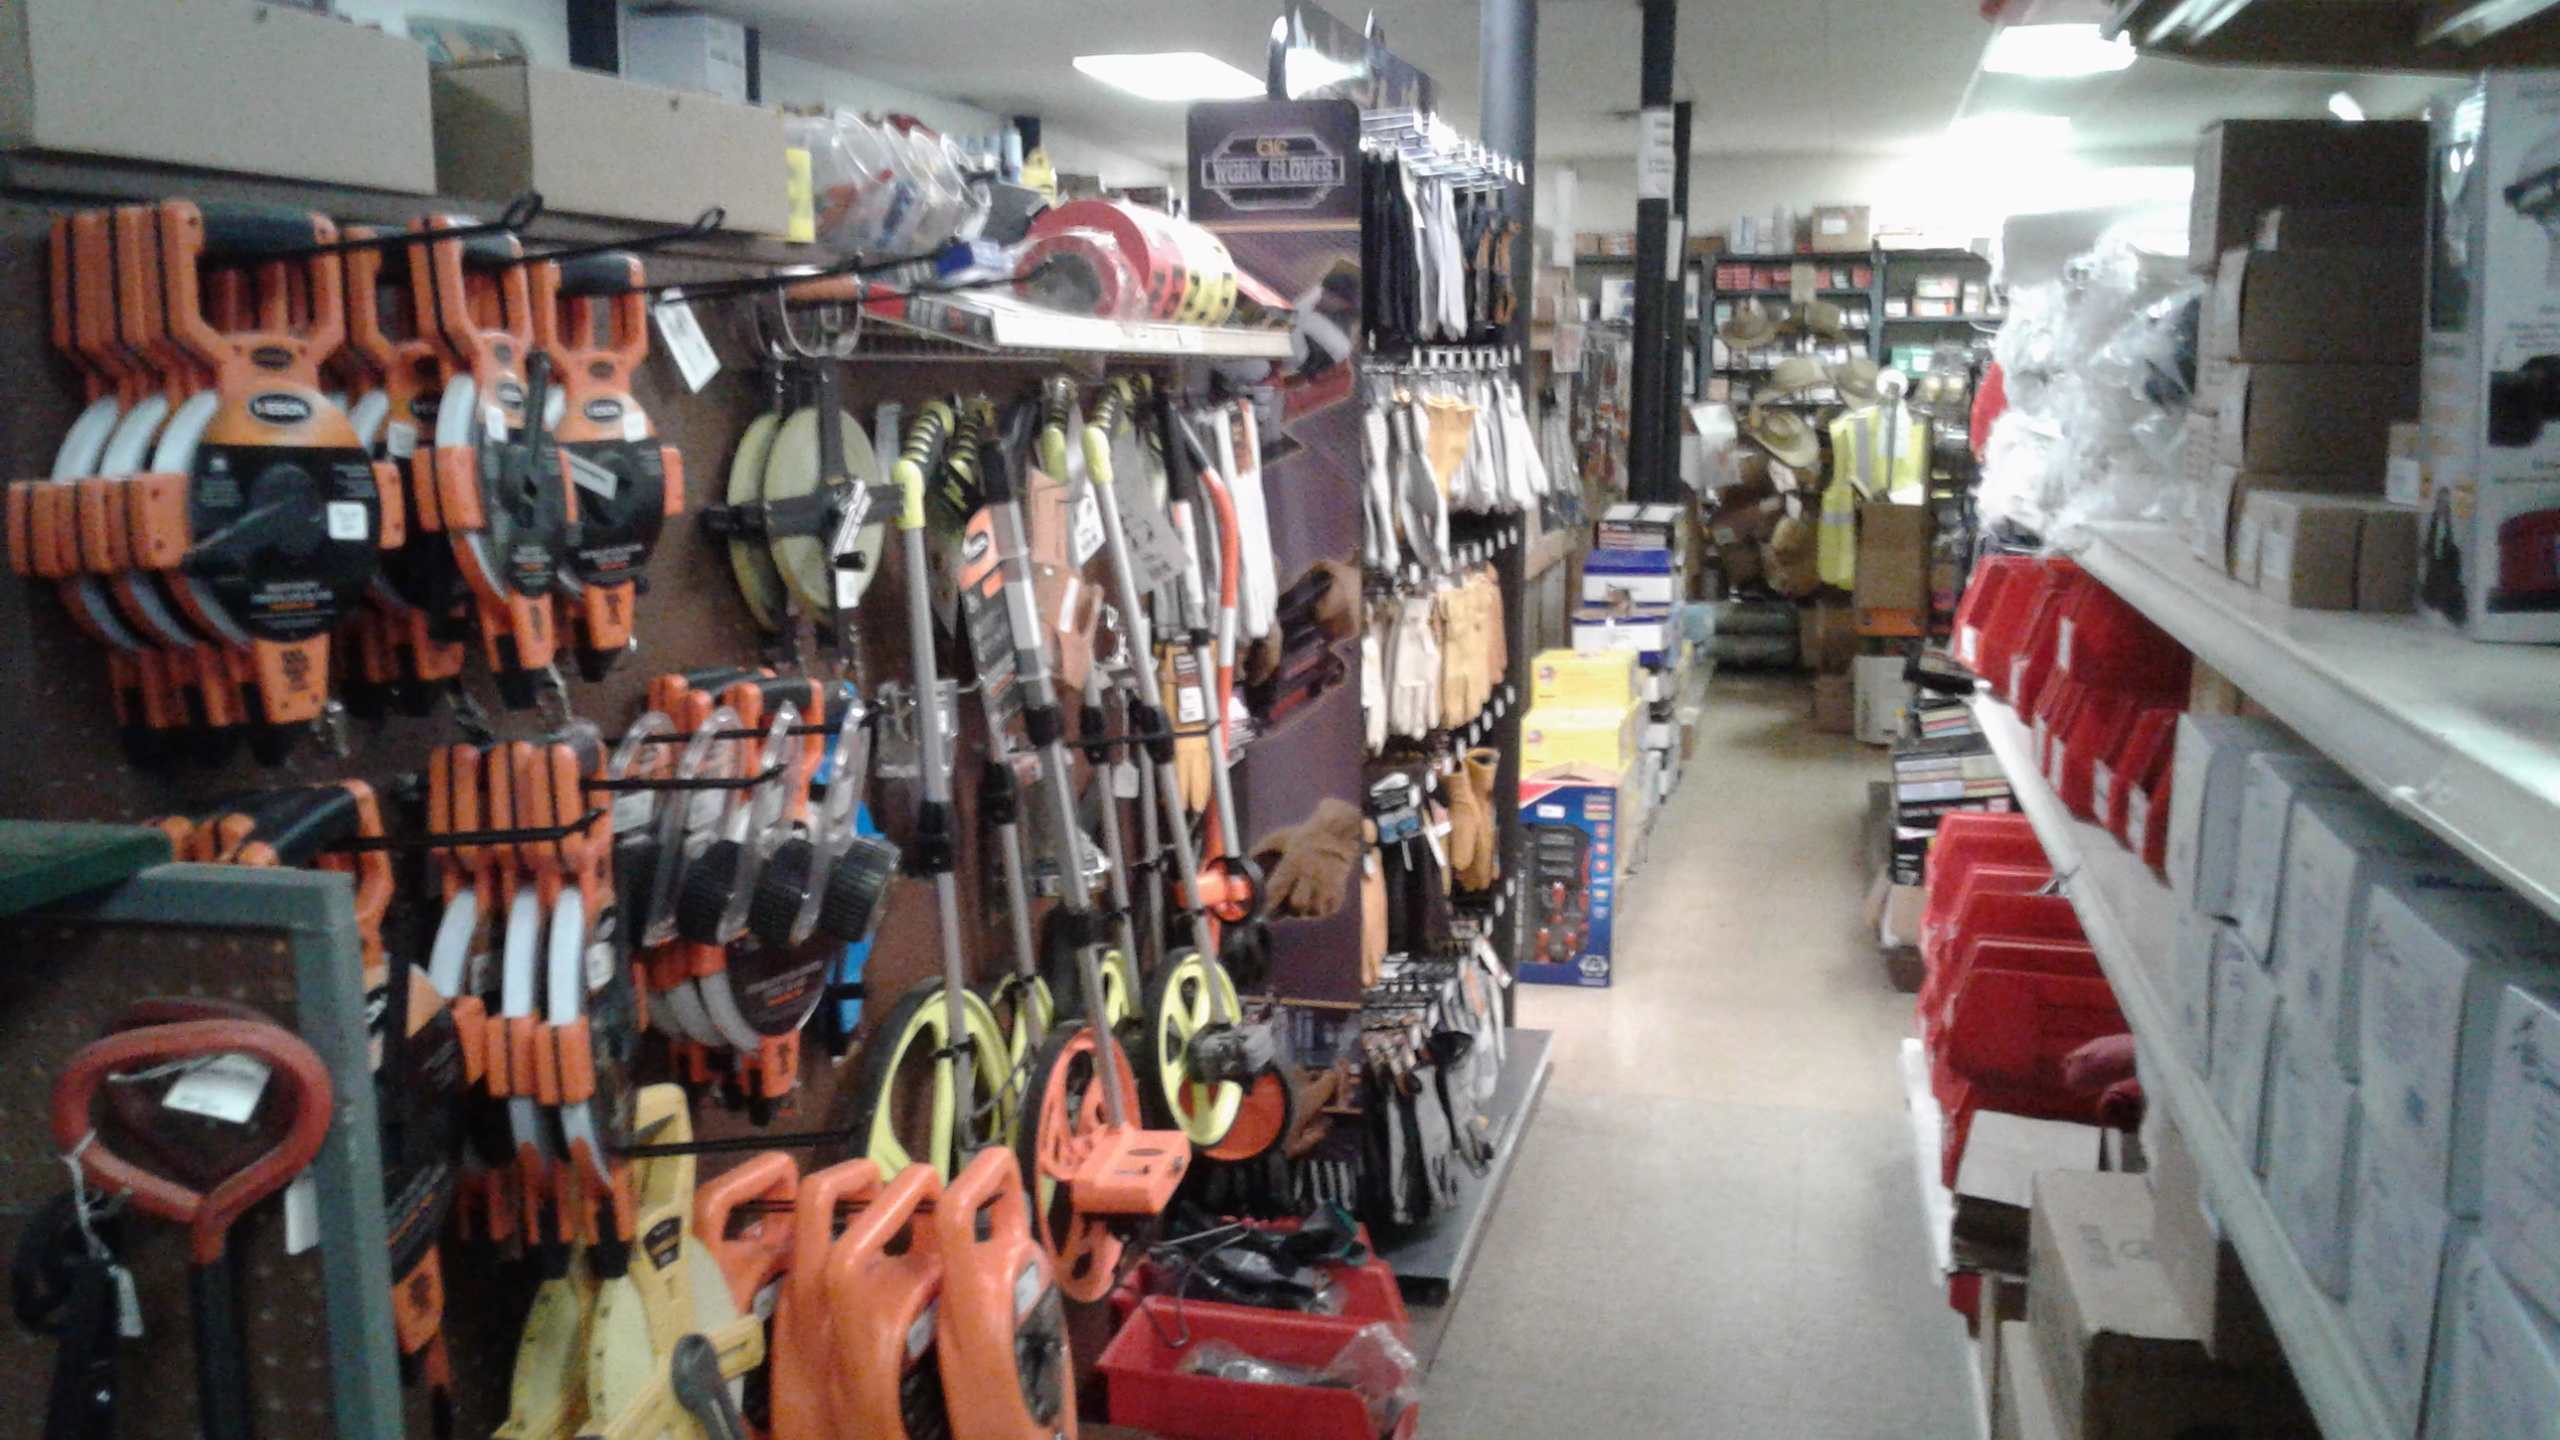 Comal Supply & Hardware Store image 3